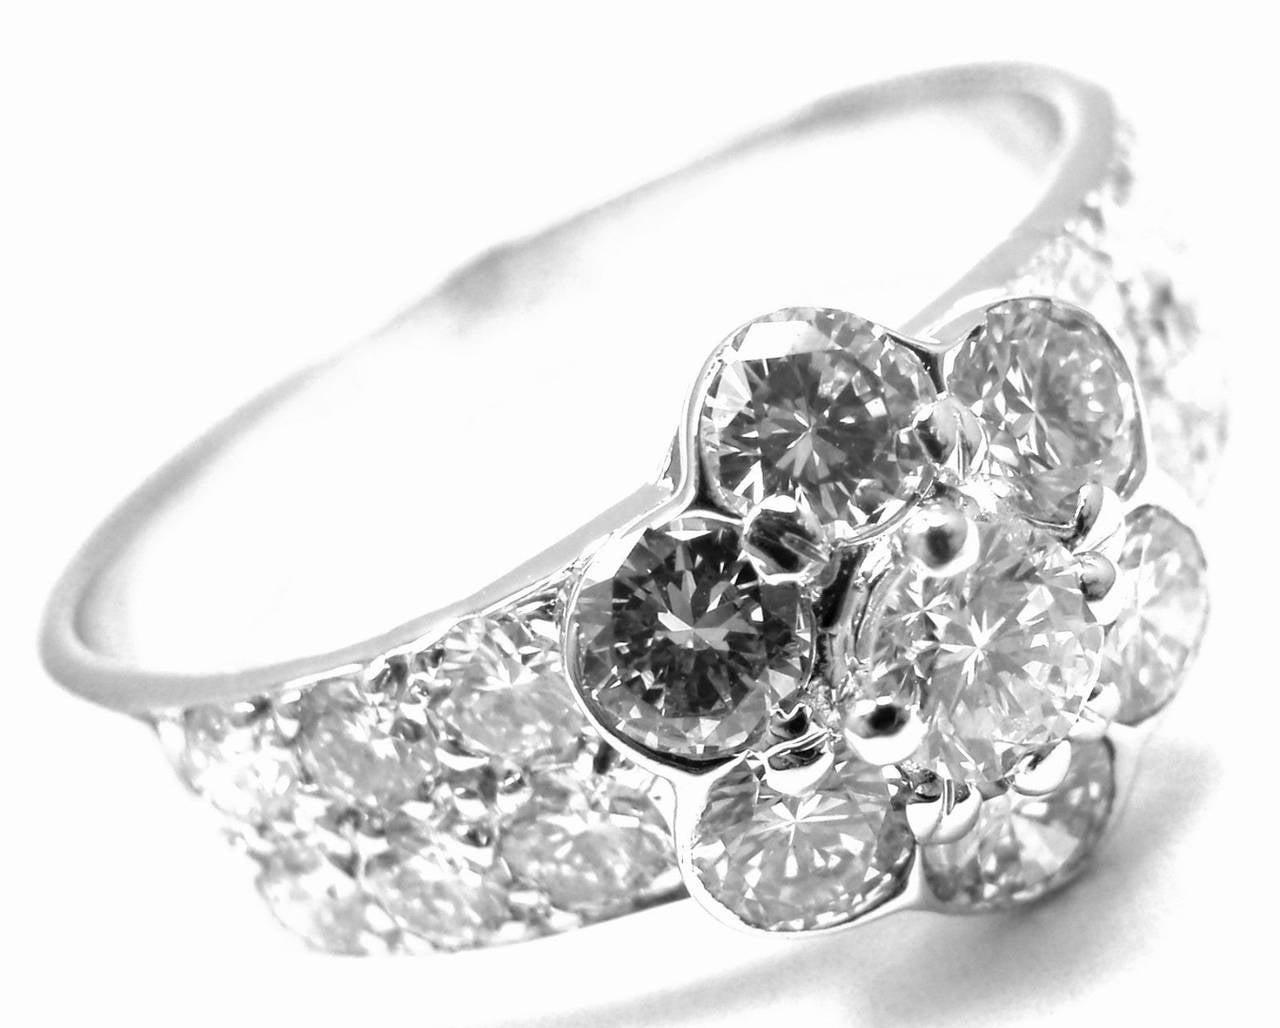 Van Cleef & Arpels Diamond Fleurette Flower Gold Ring 2